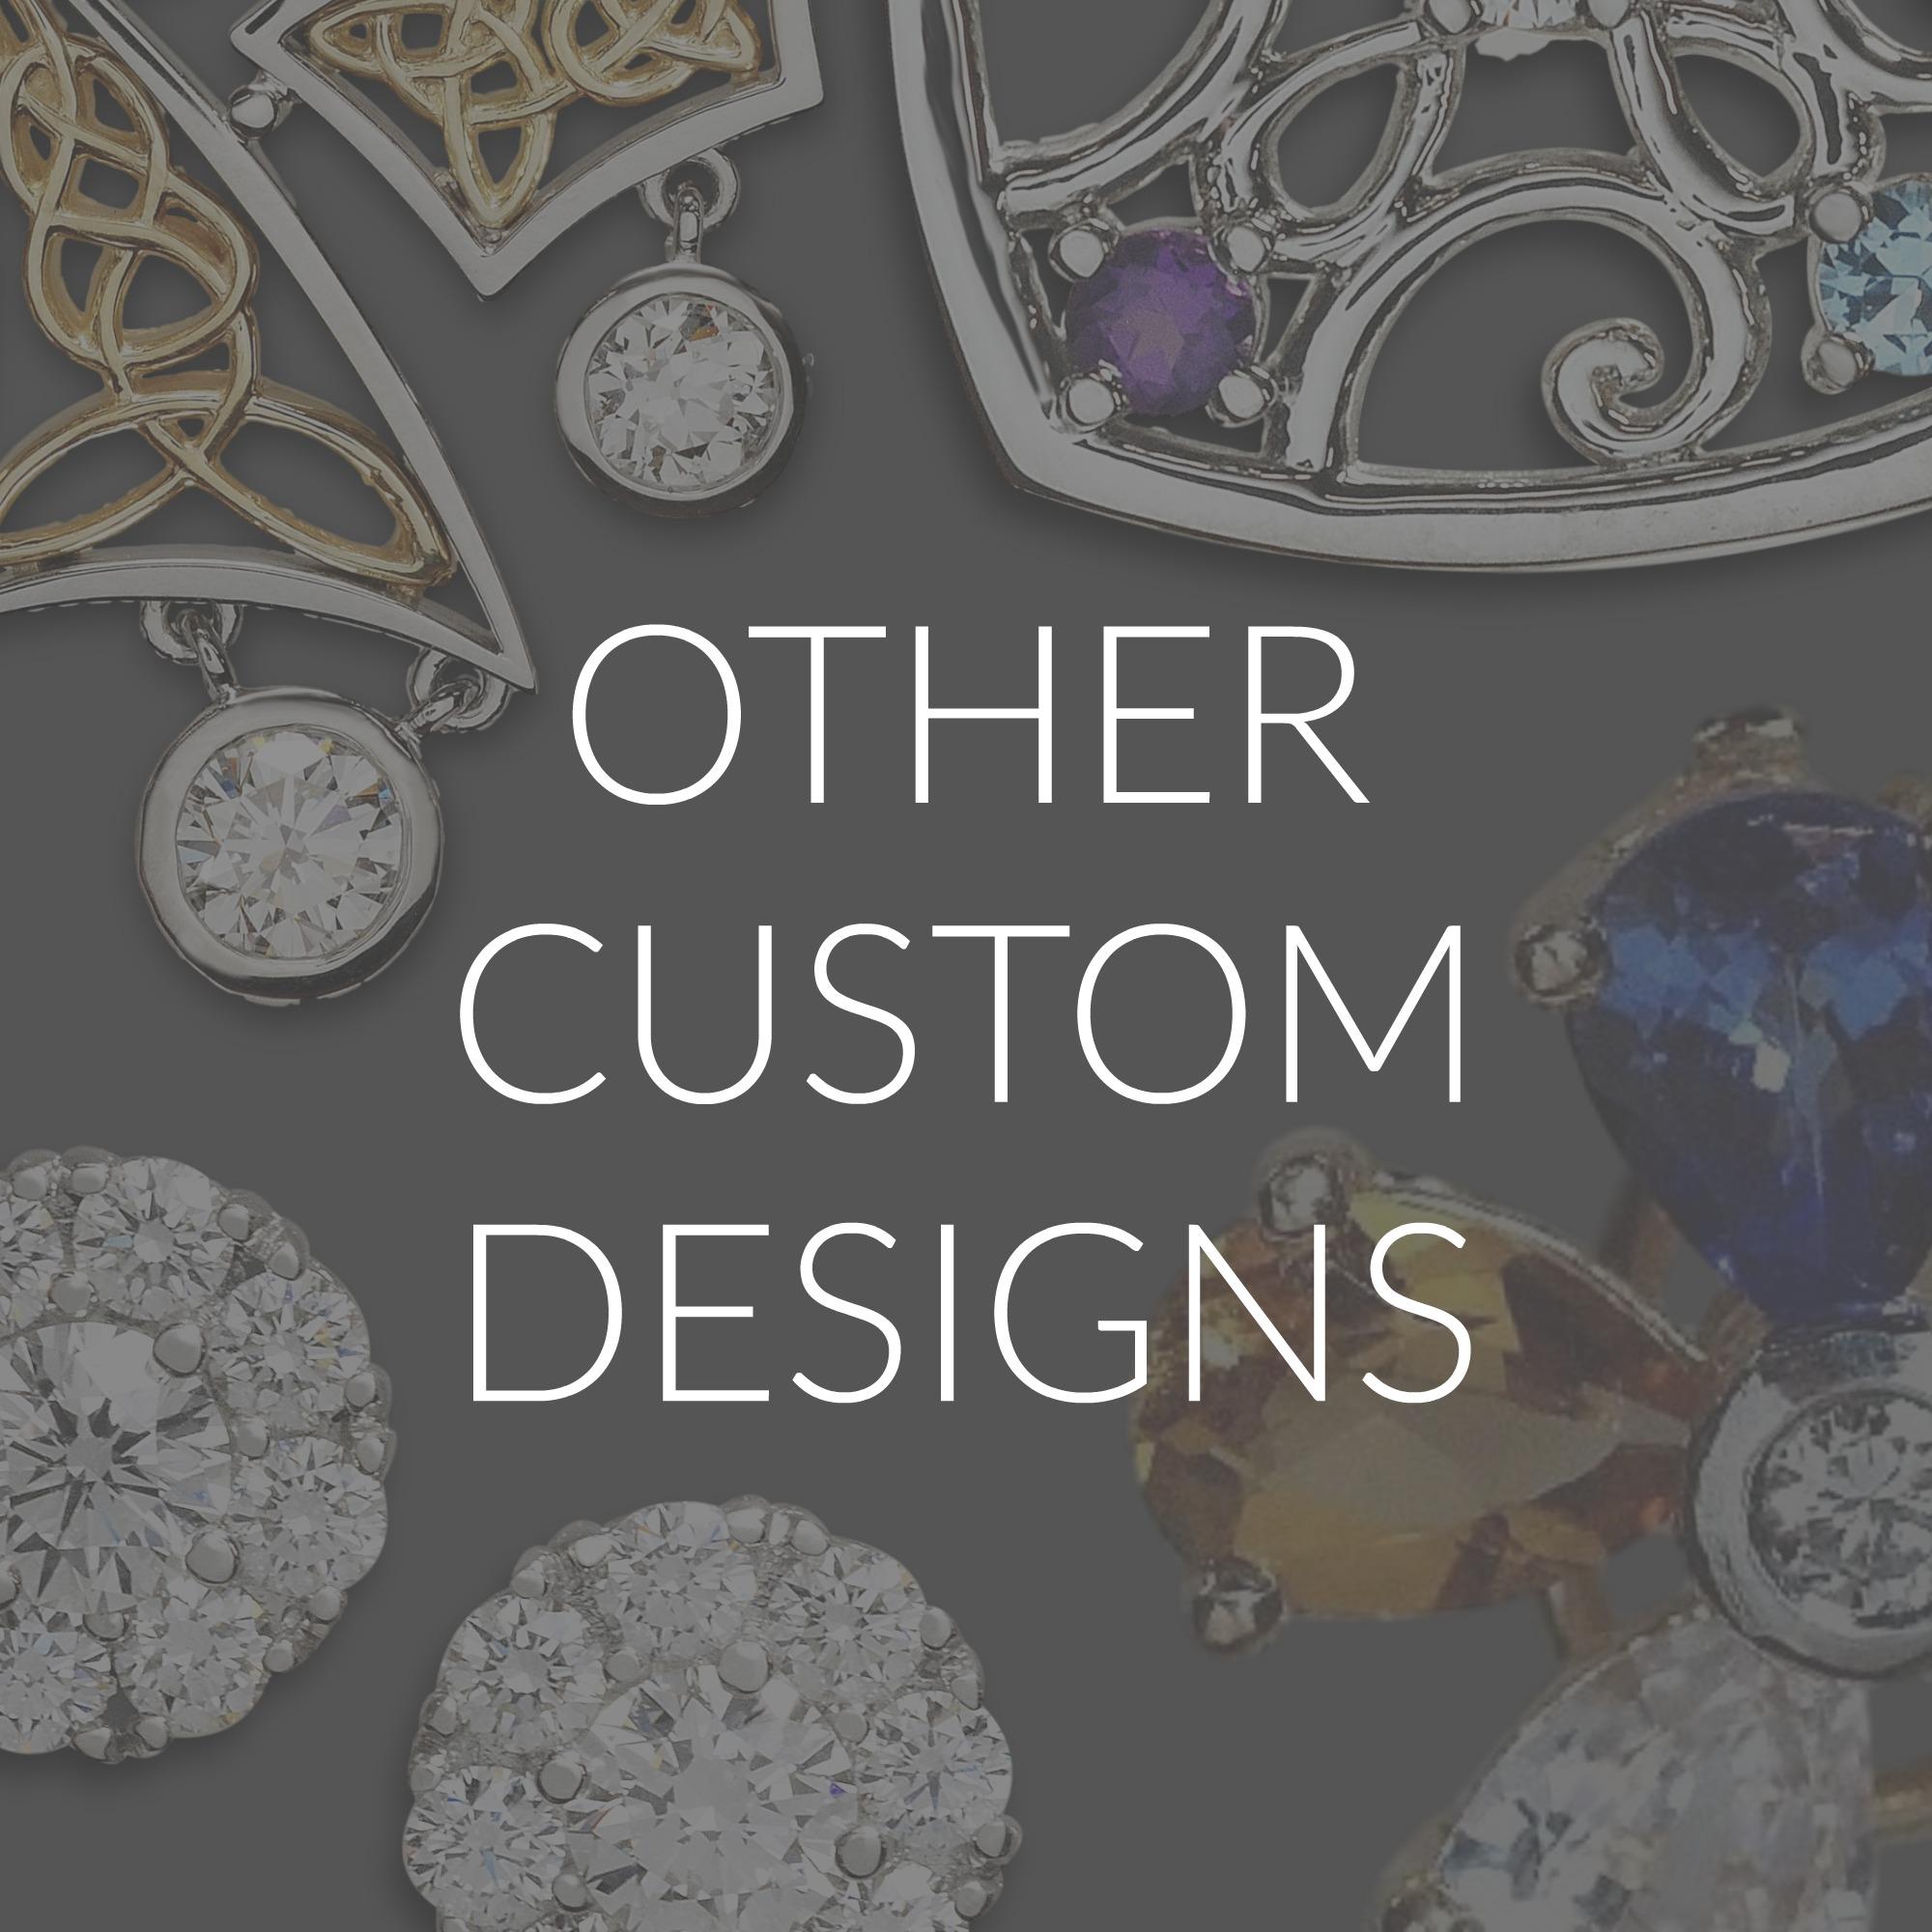 Other Custom Designs.jpg